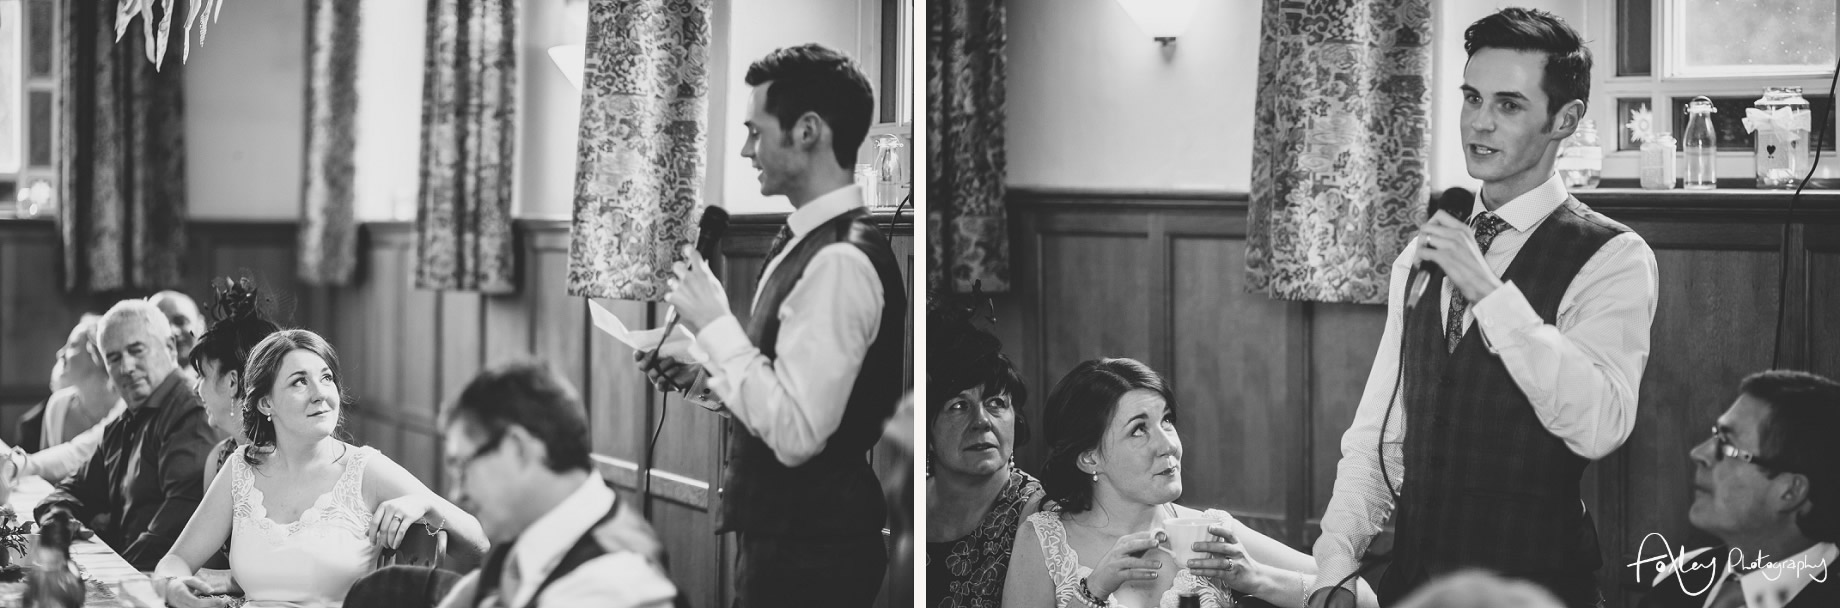 Mel-and-Lewis-Wedding-at-Barley-Village-Hall-152